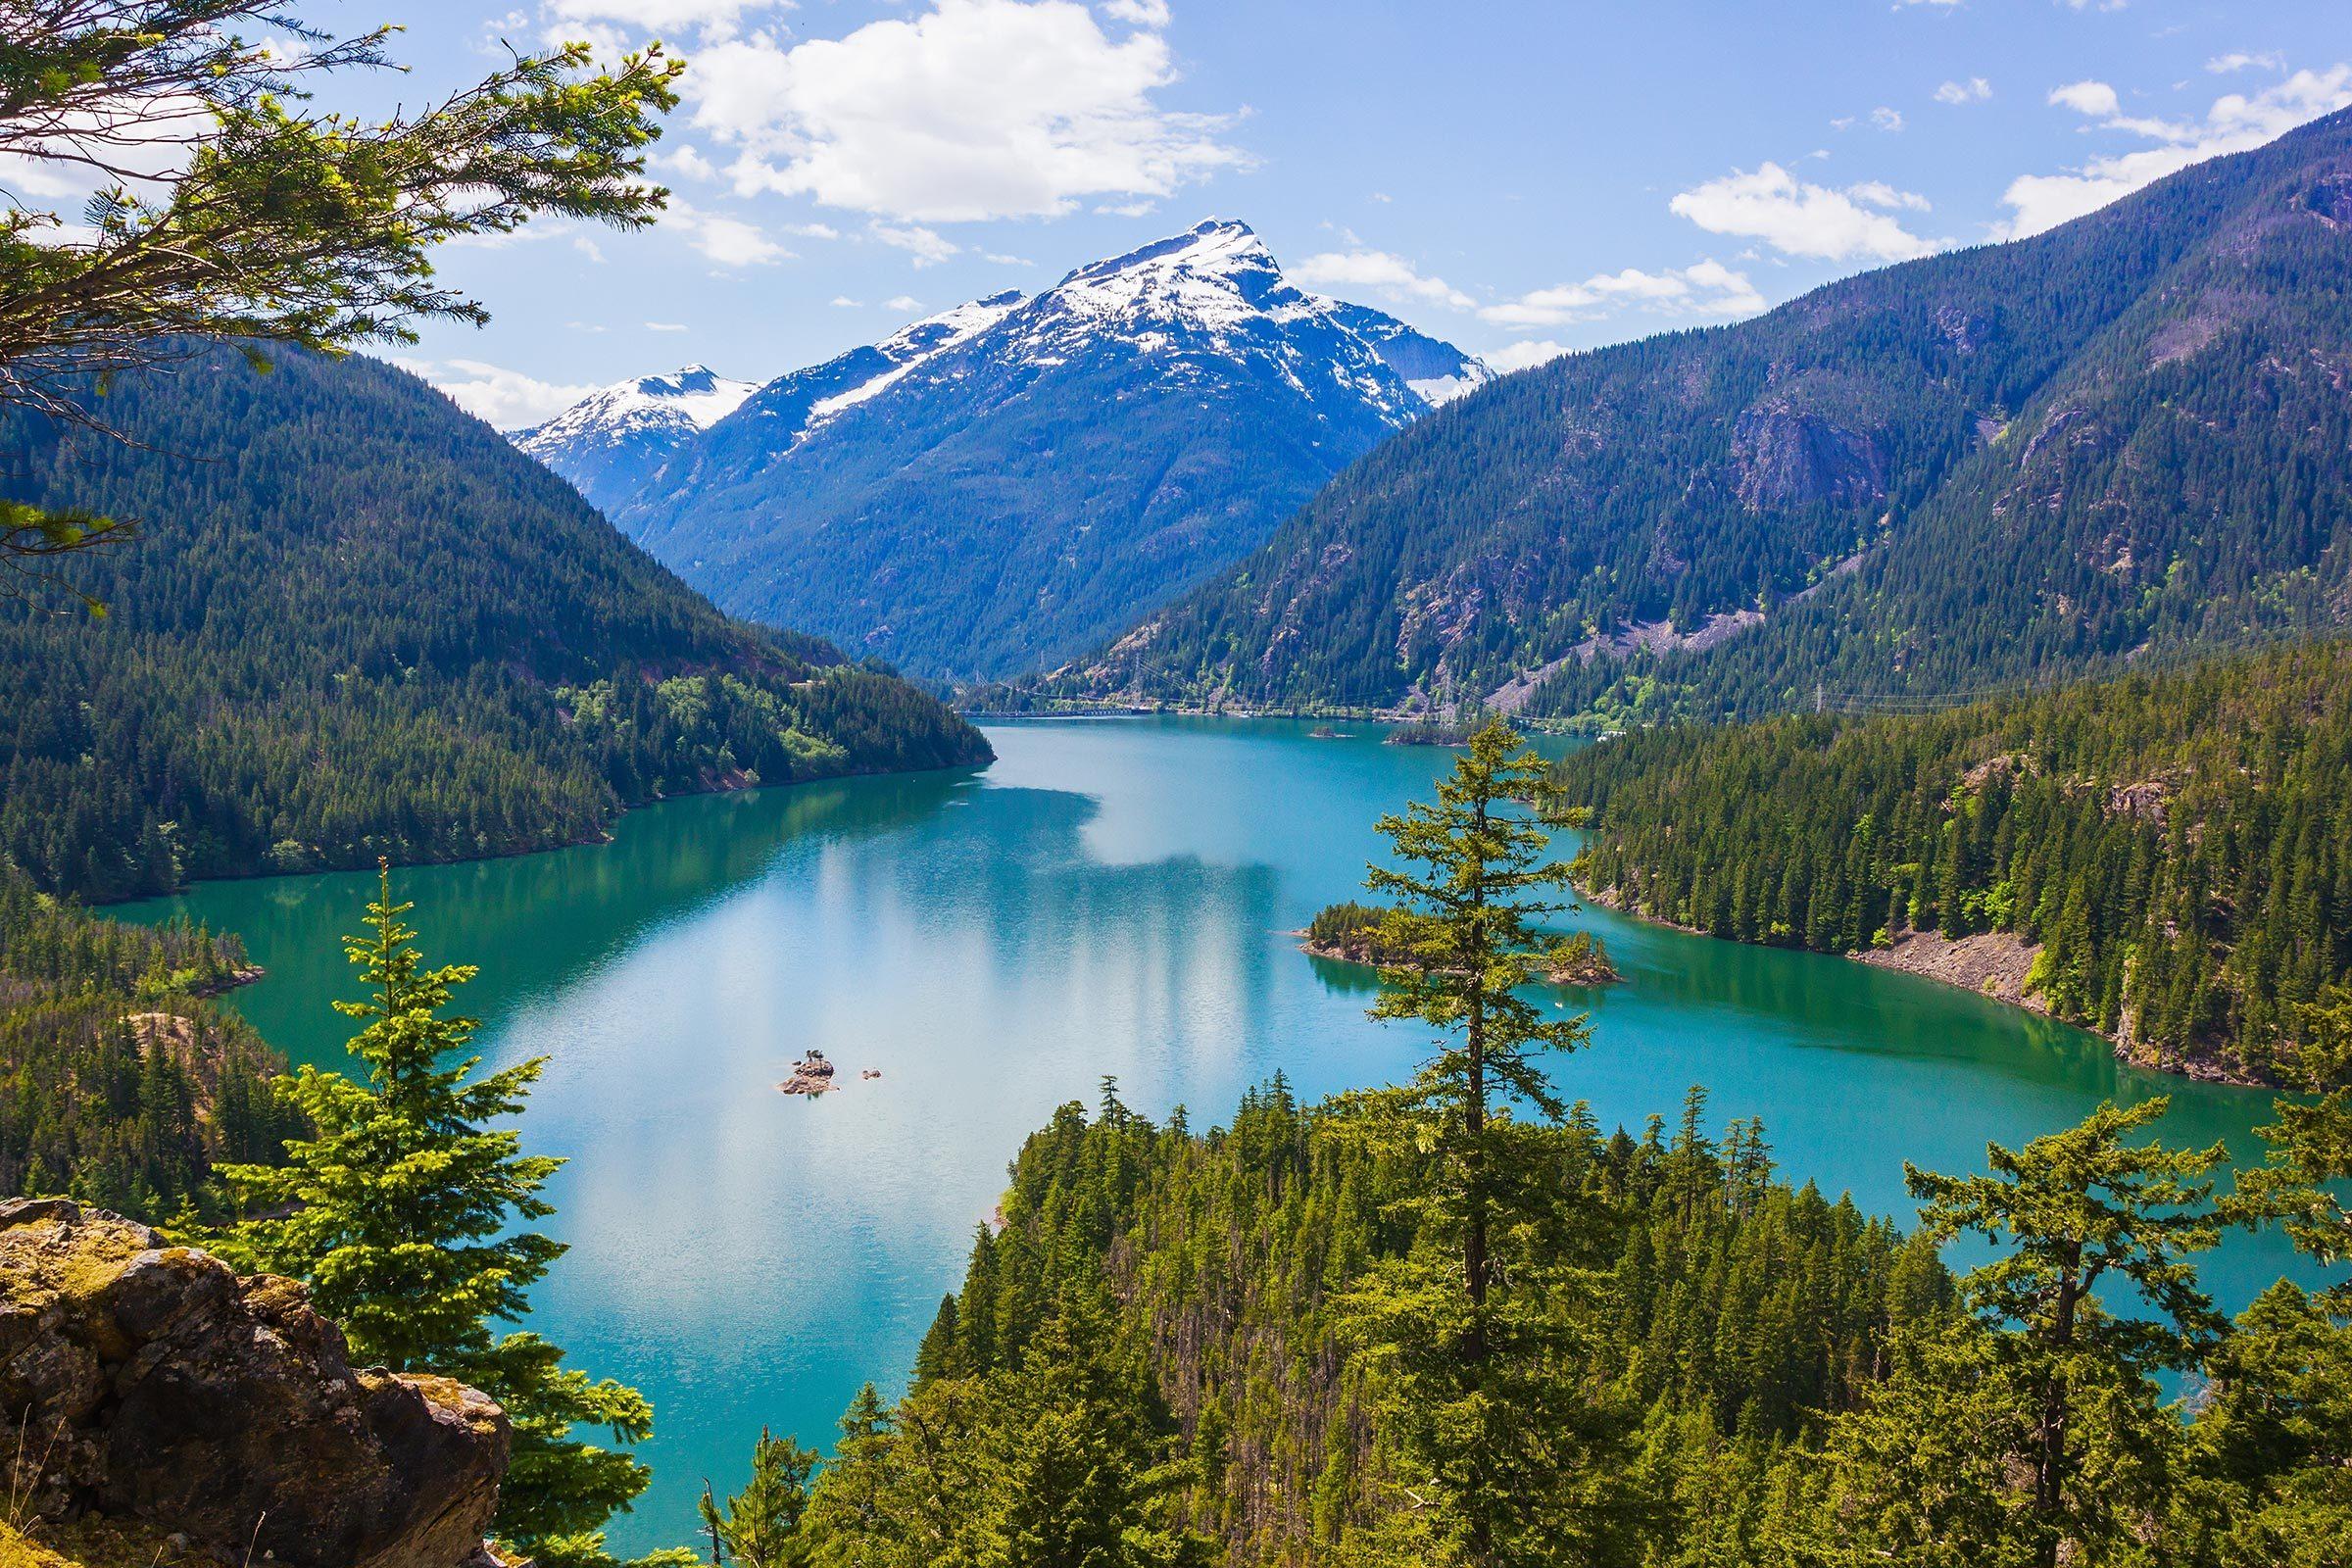 Diablo lake. North Cascades National Park, Washington, USA